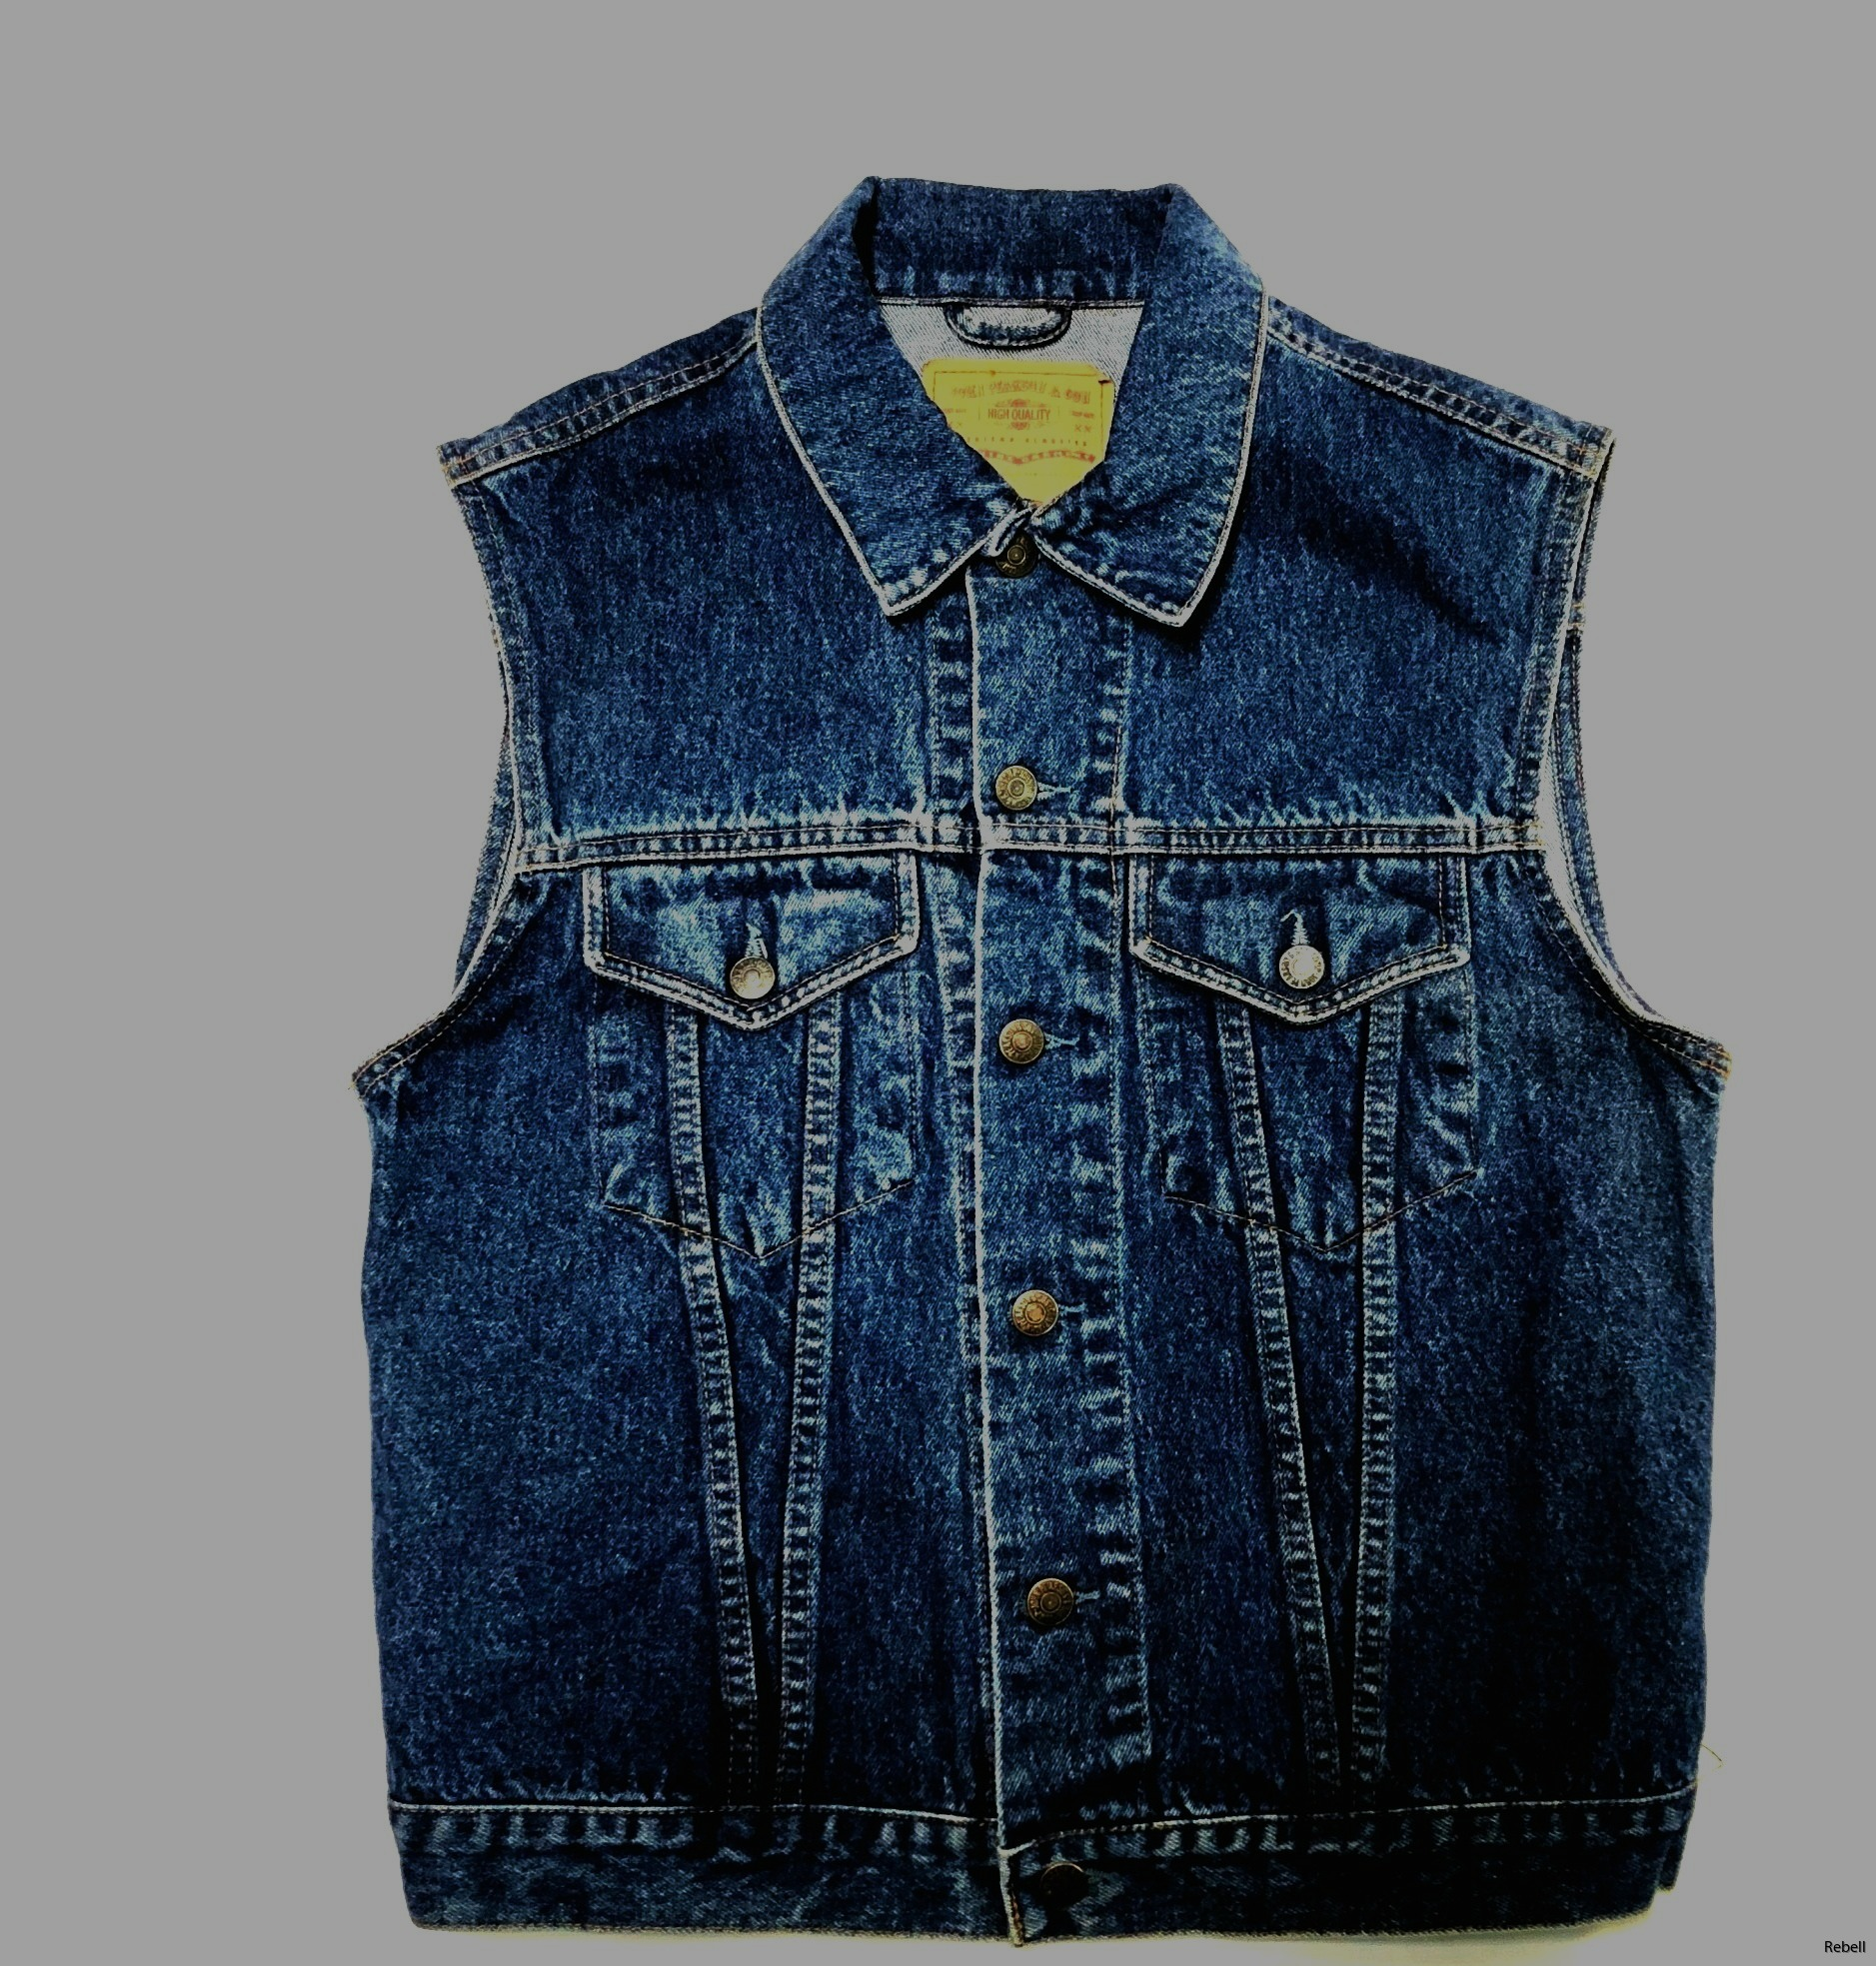 Jeansväst väst jeans amerikansjeansväst vintage design rebell rebellclothes